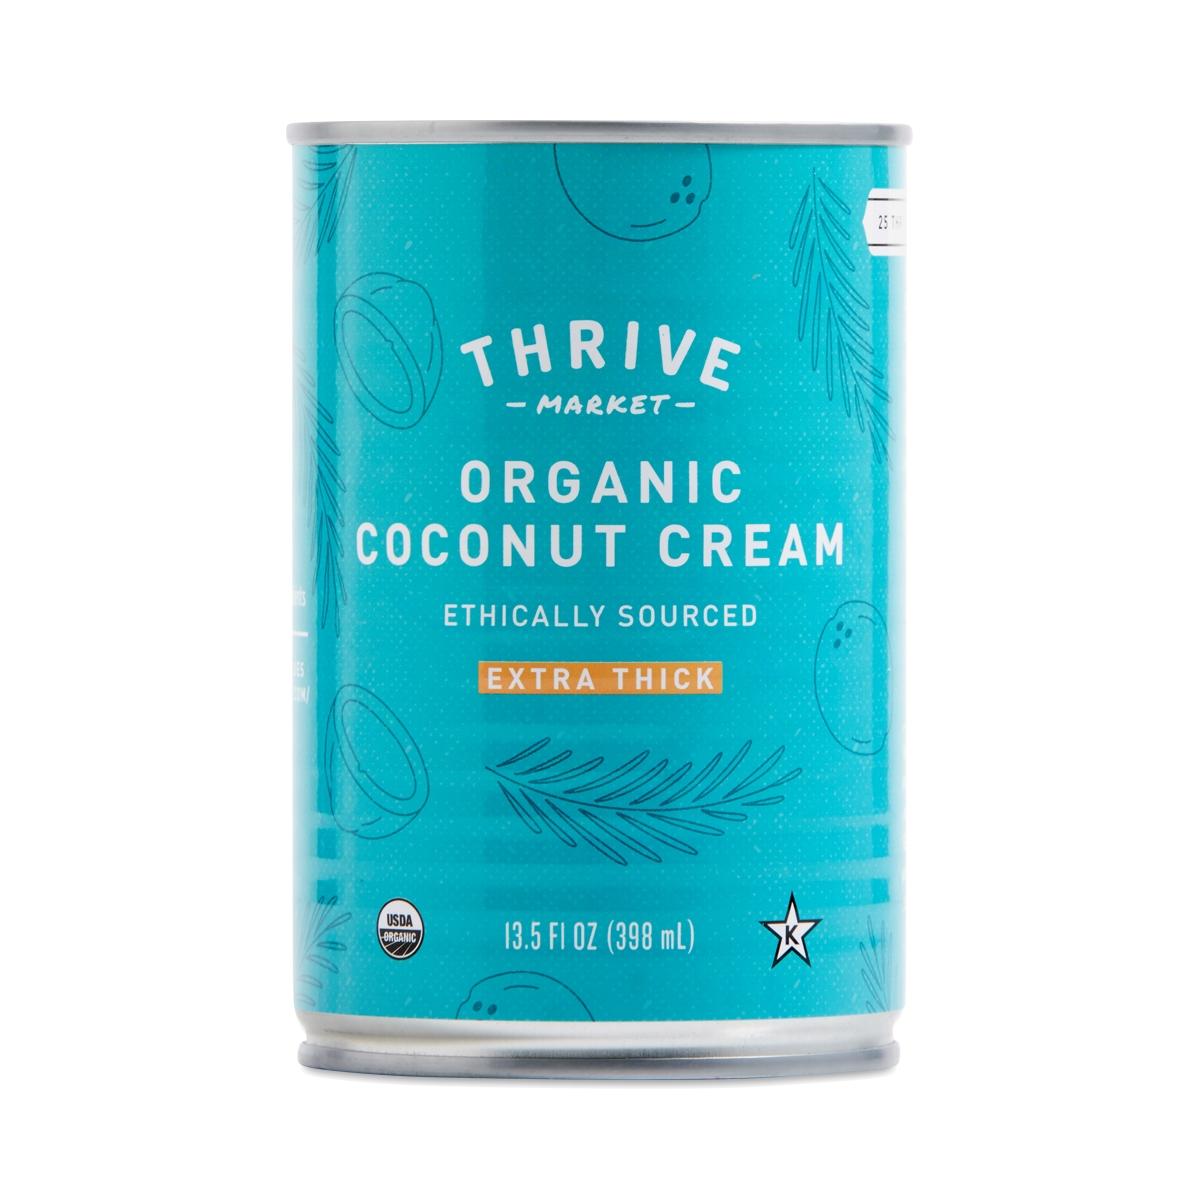 Thrive Market Organic Coconut Cream 13.5 oz can